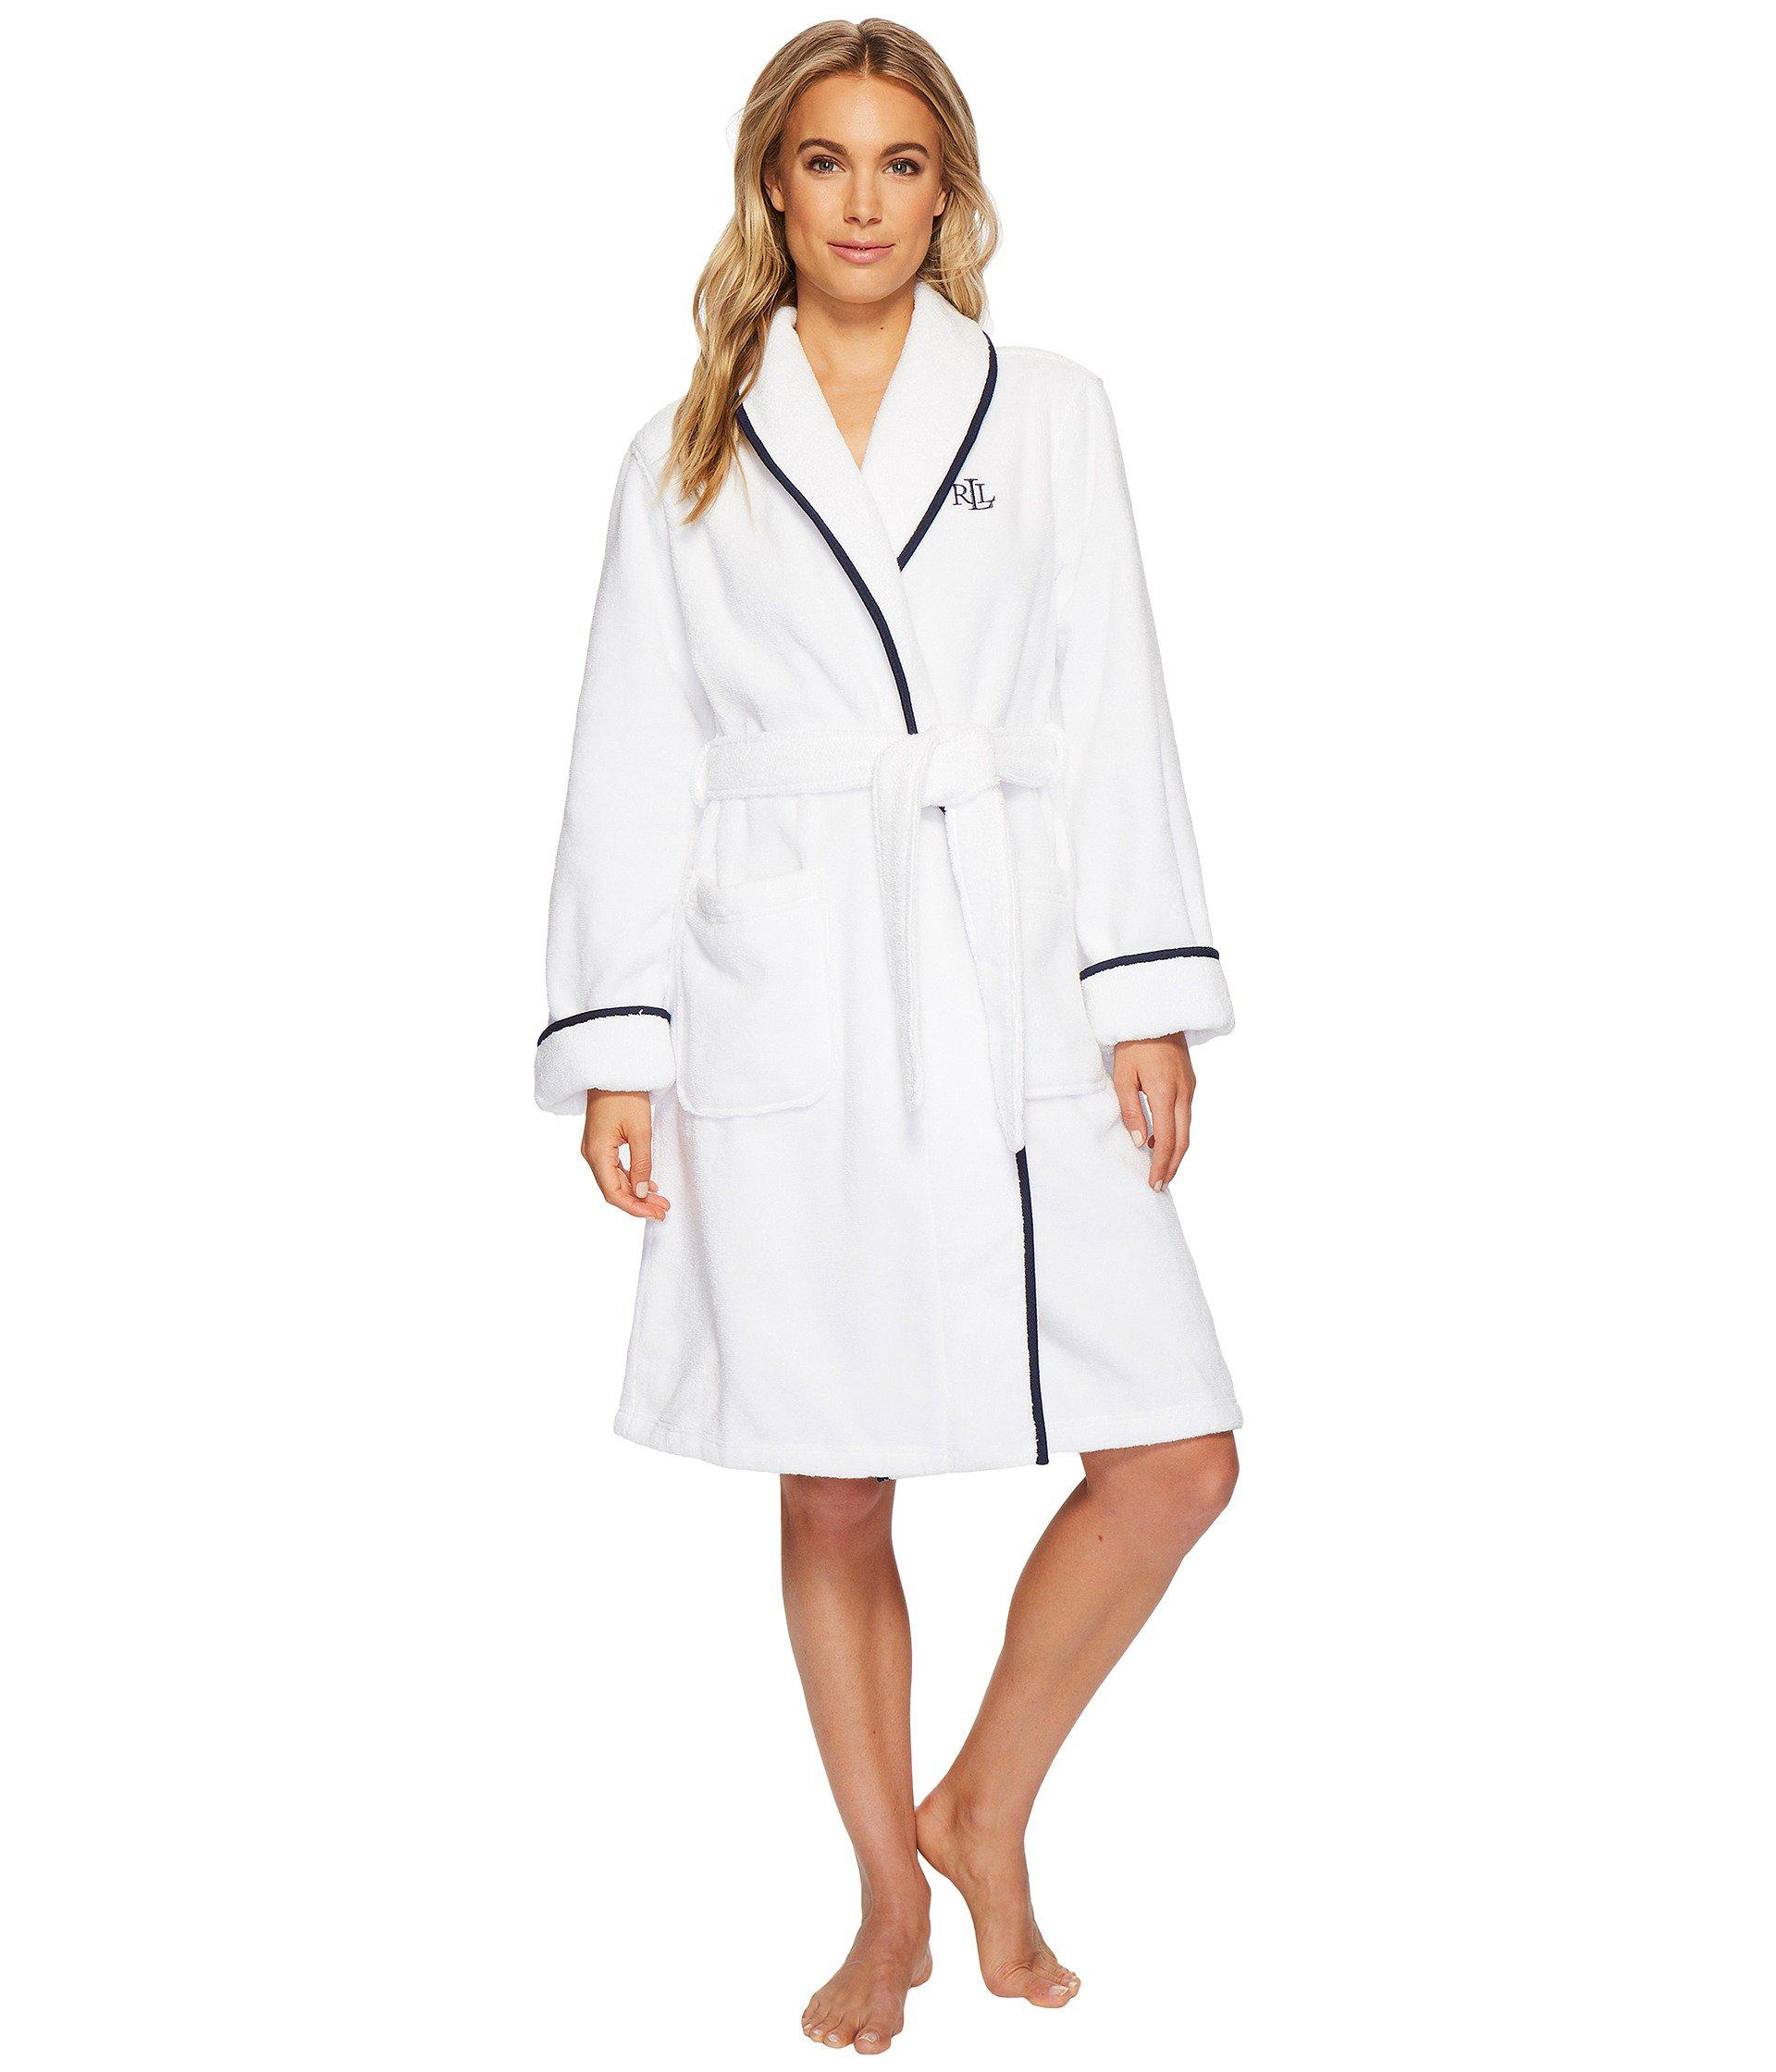 53dddb27fb Lyst - Lauren by Ralph Lauren Cotton Terry Shawl Collar Robe With ...